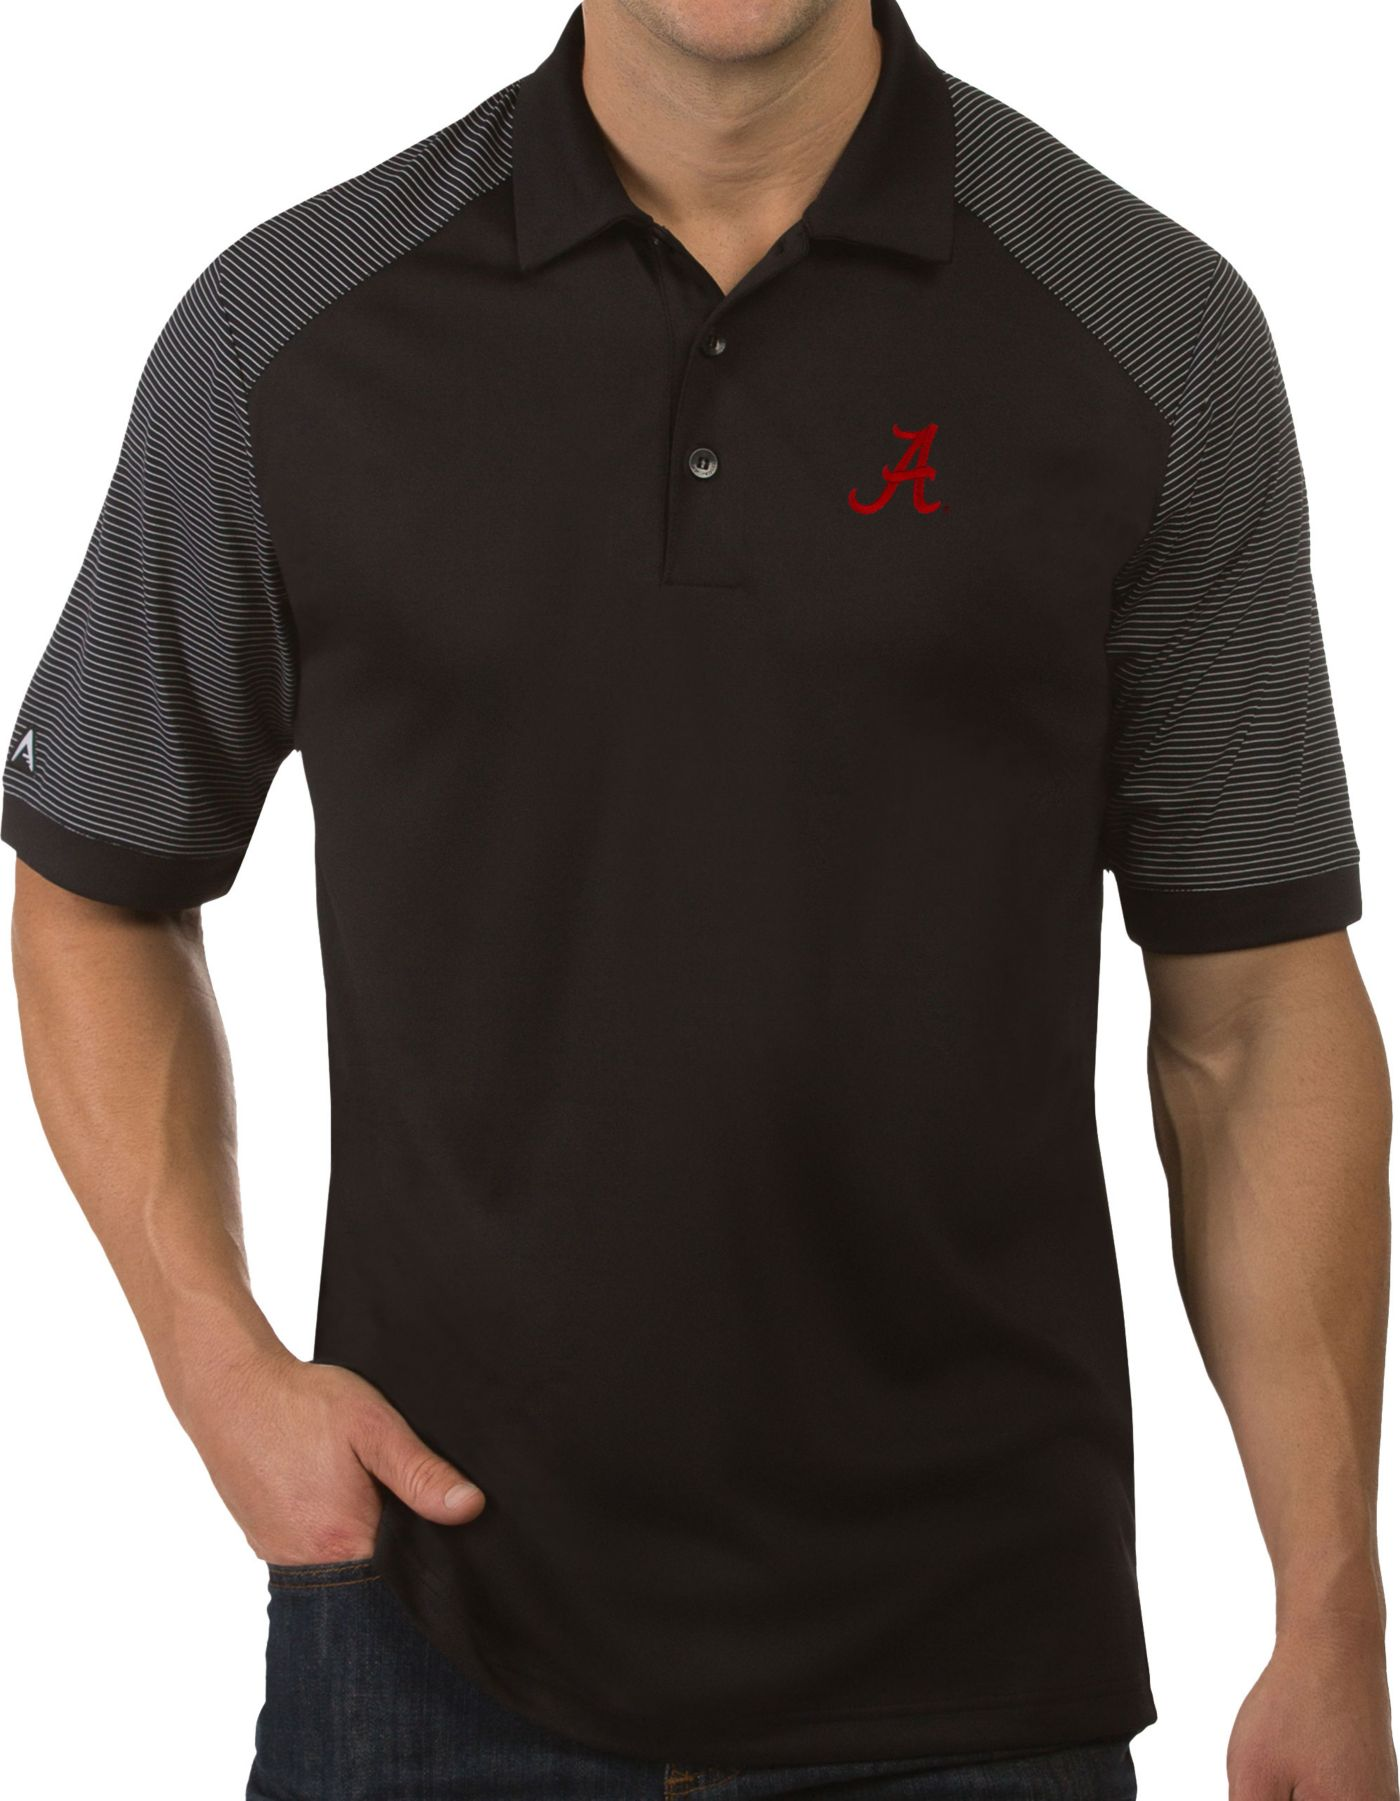 Antigua Men's Alabama Crimson Tide Engage Performance Black Polo